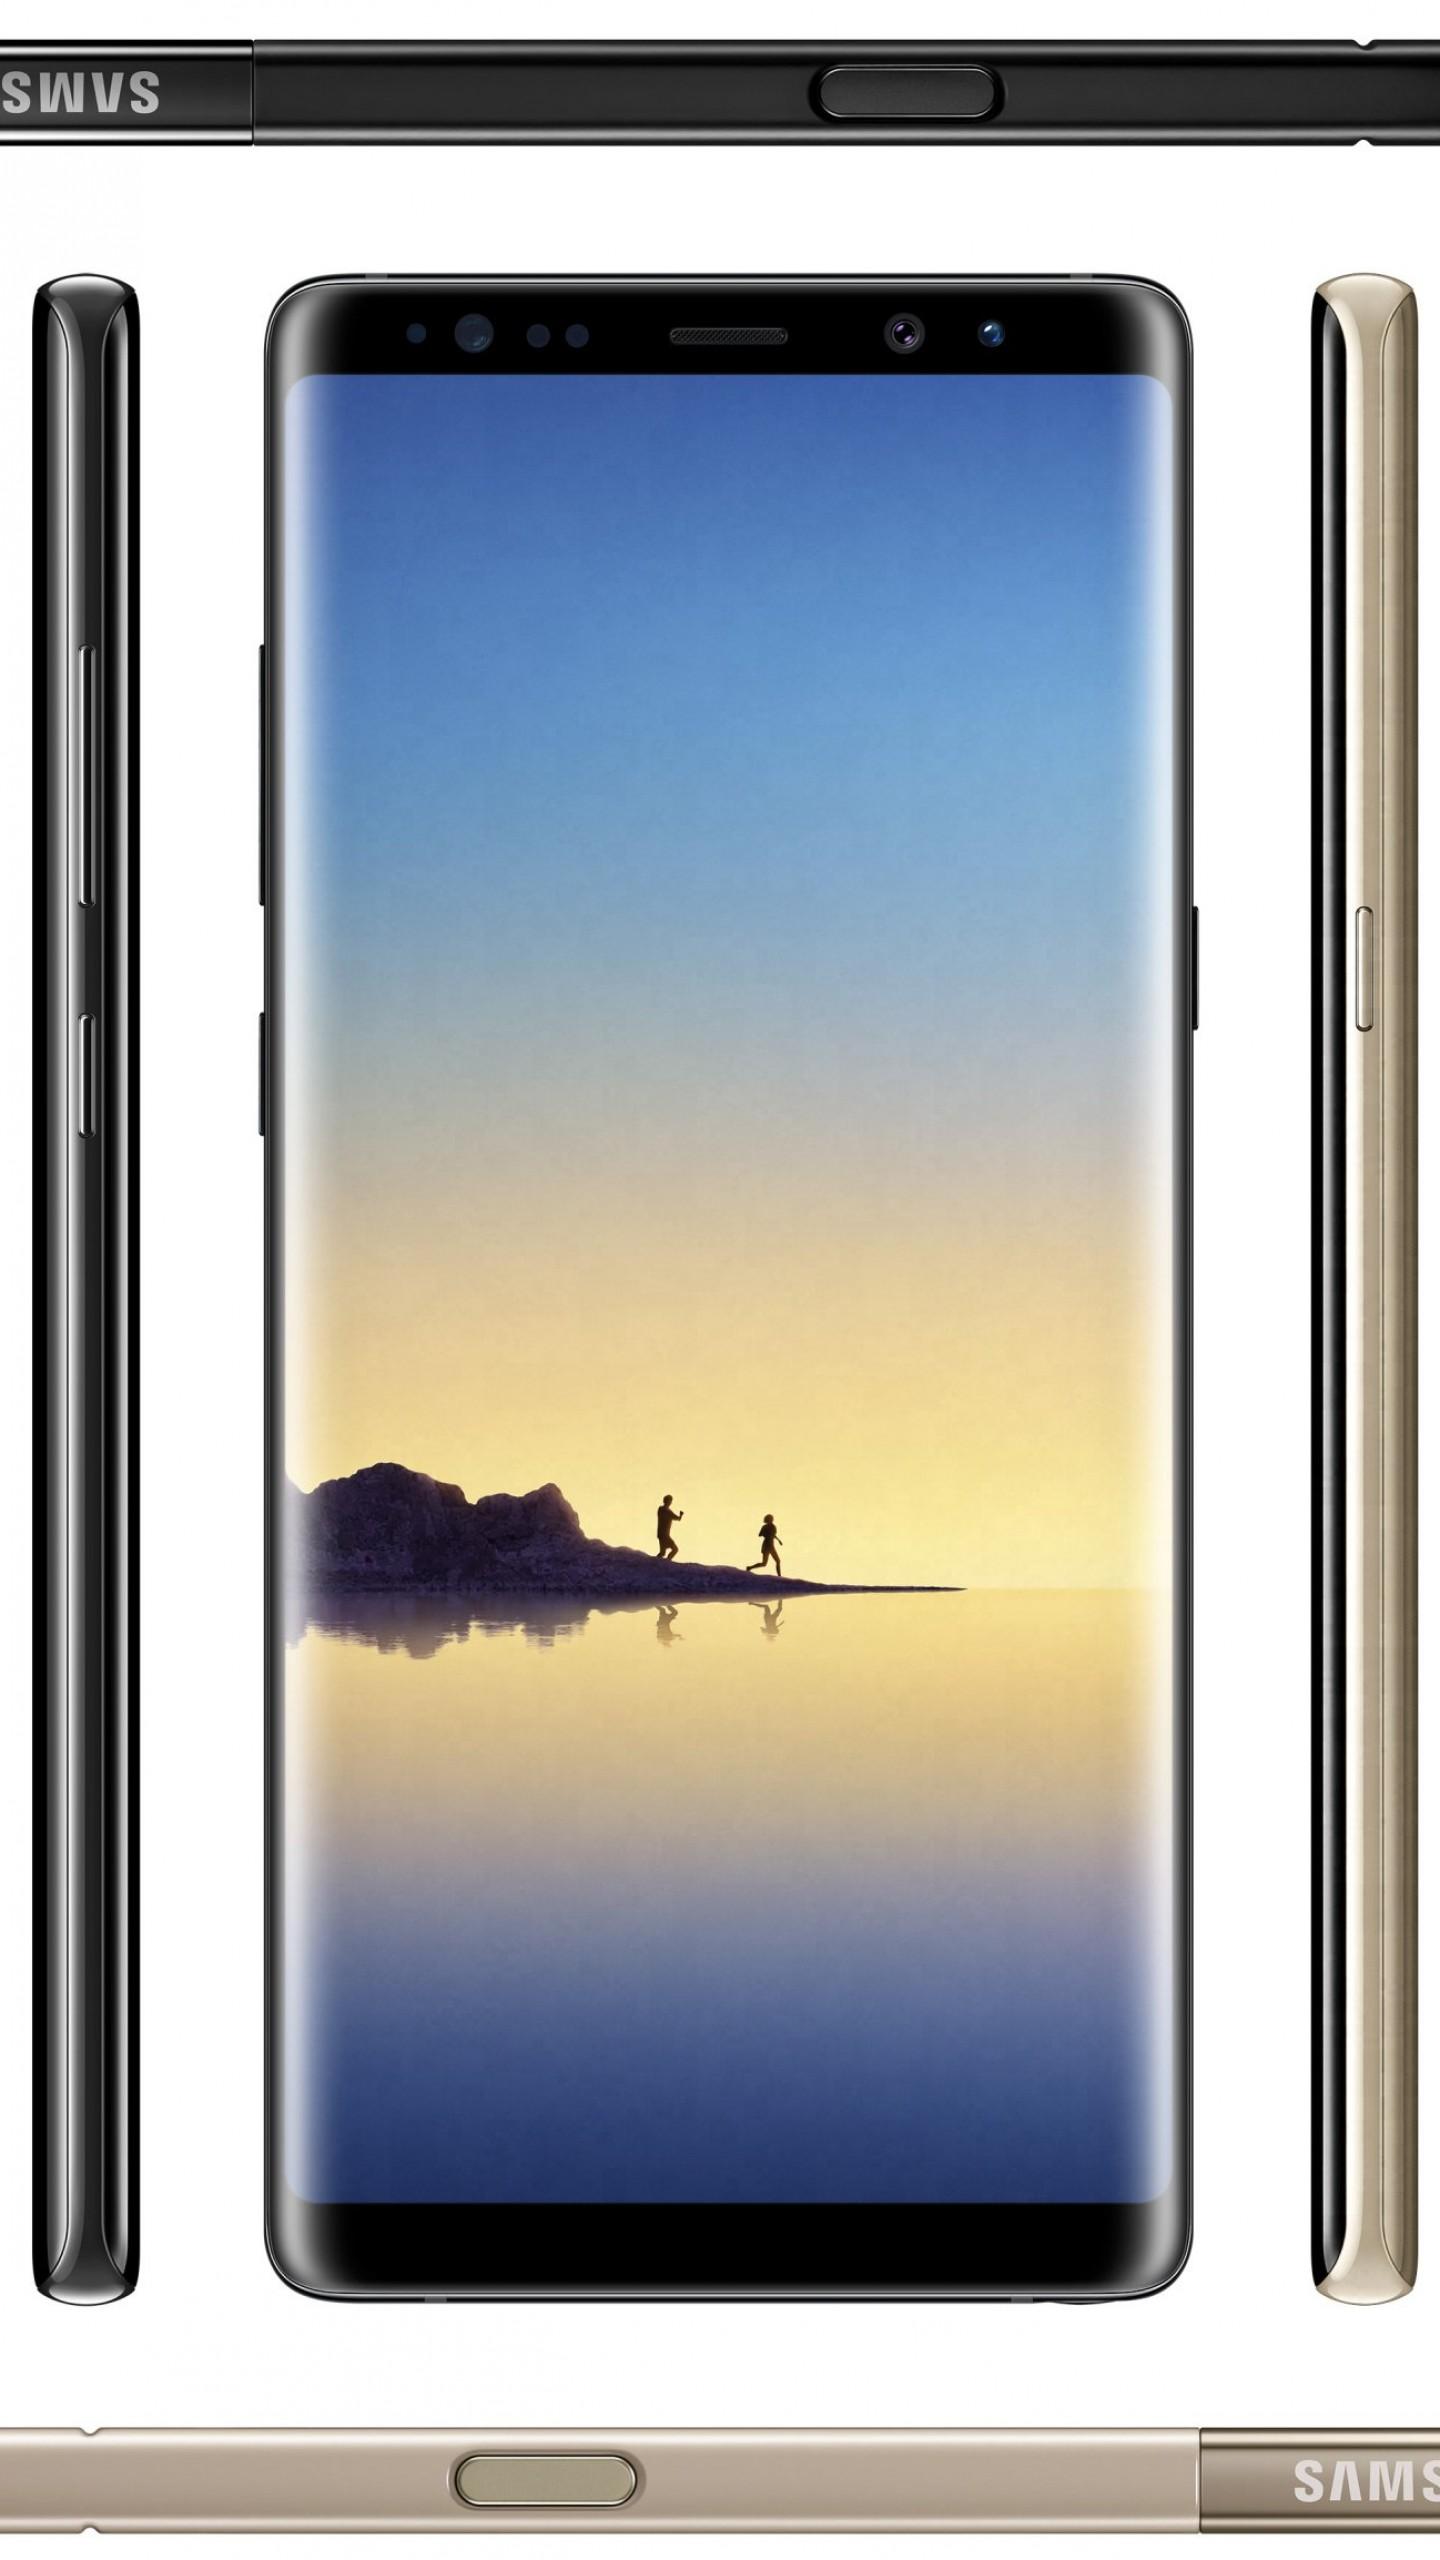 Wallpaper Samsung Galaxy Note 8 Smartphone 4k Hi Tech 15414